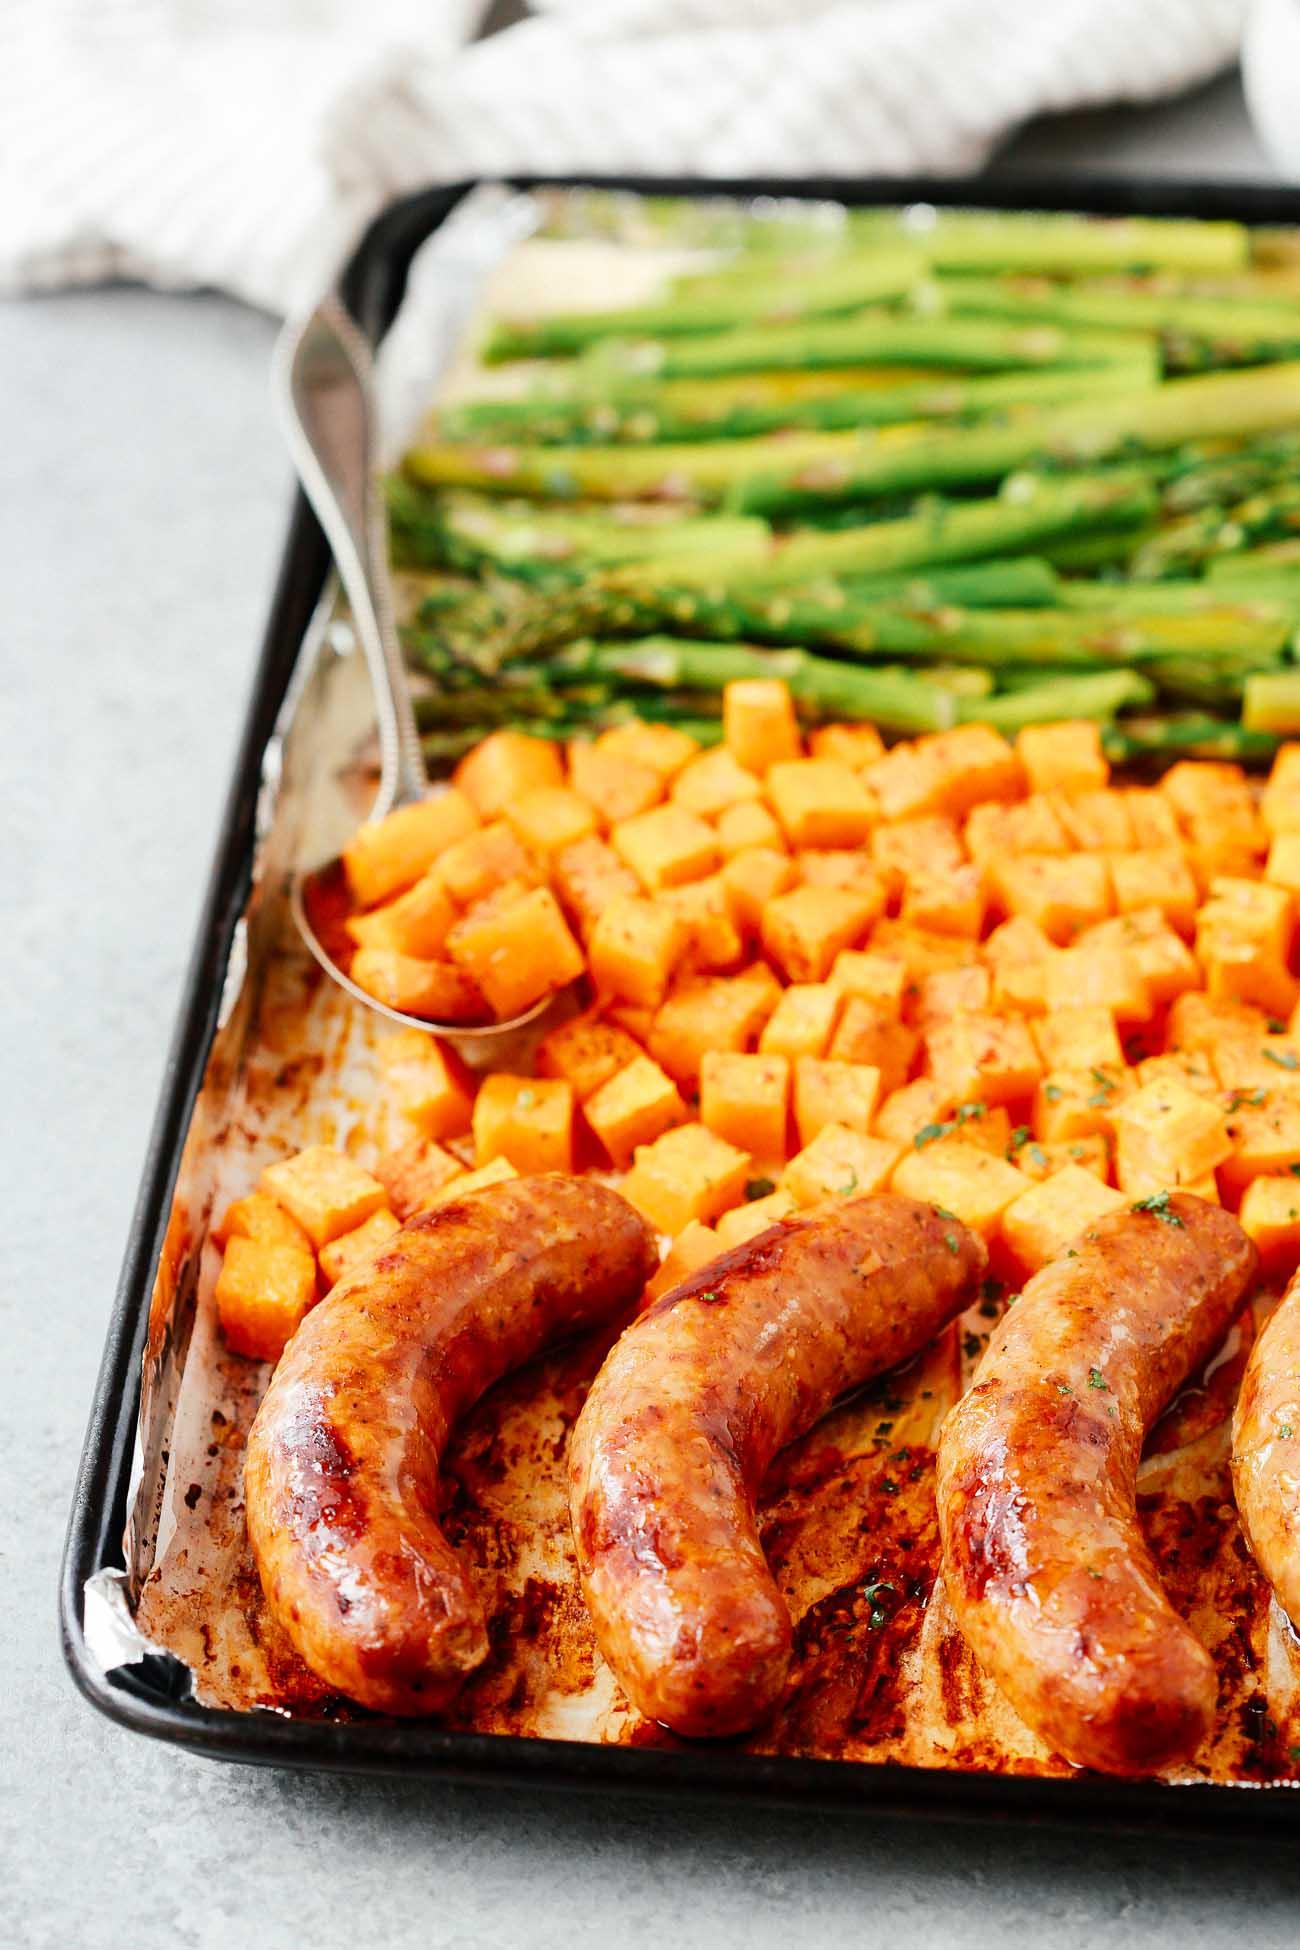 Sheet pan with sausage, sweet potatoes, and asparagus.